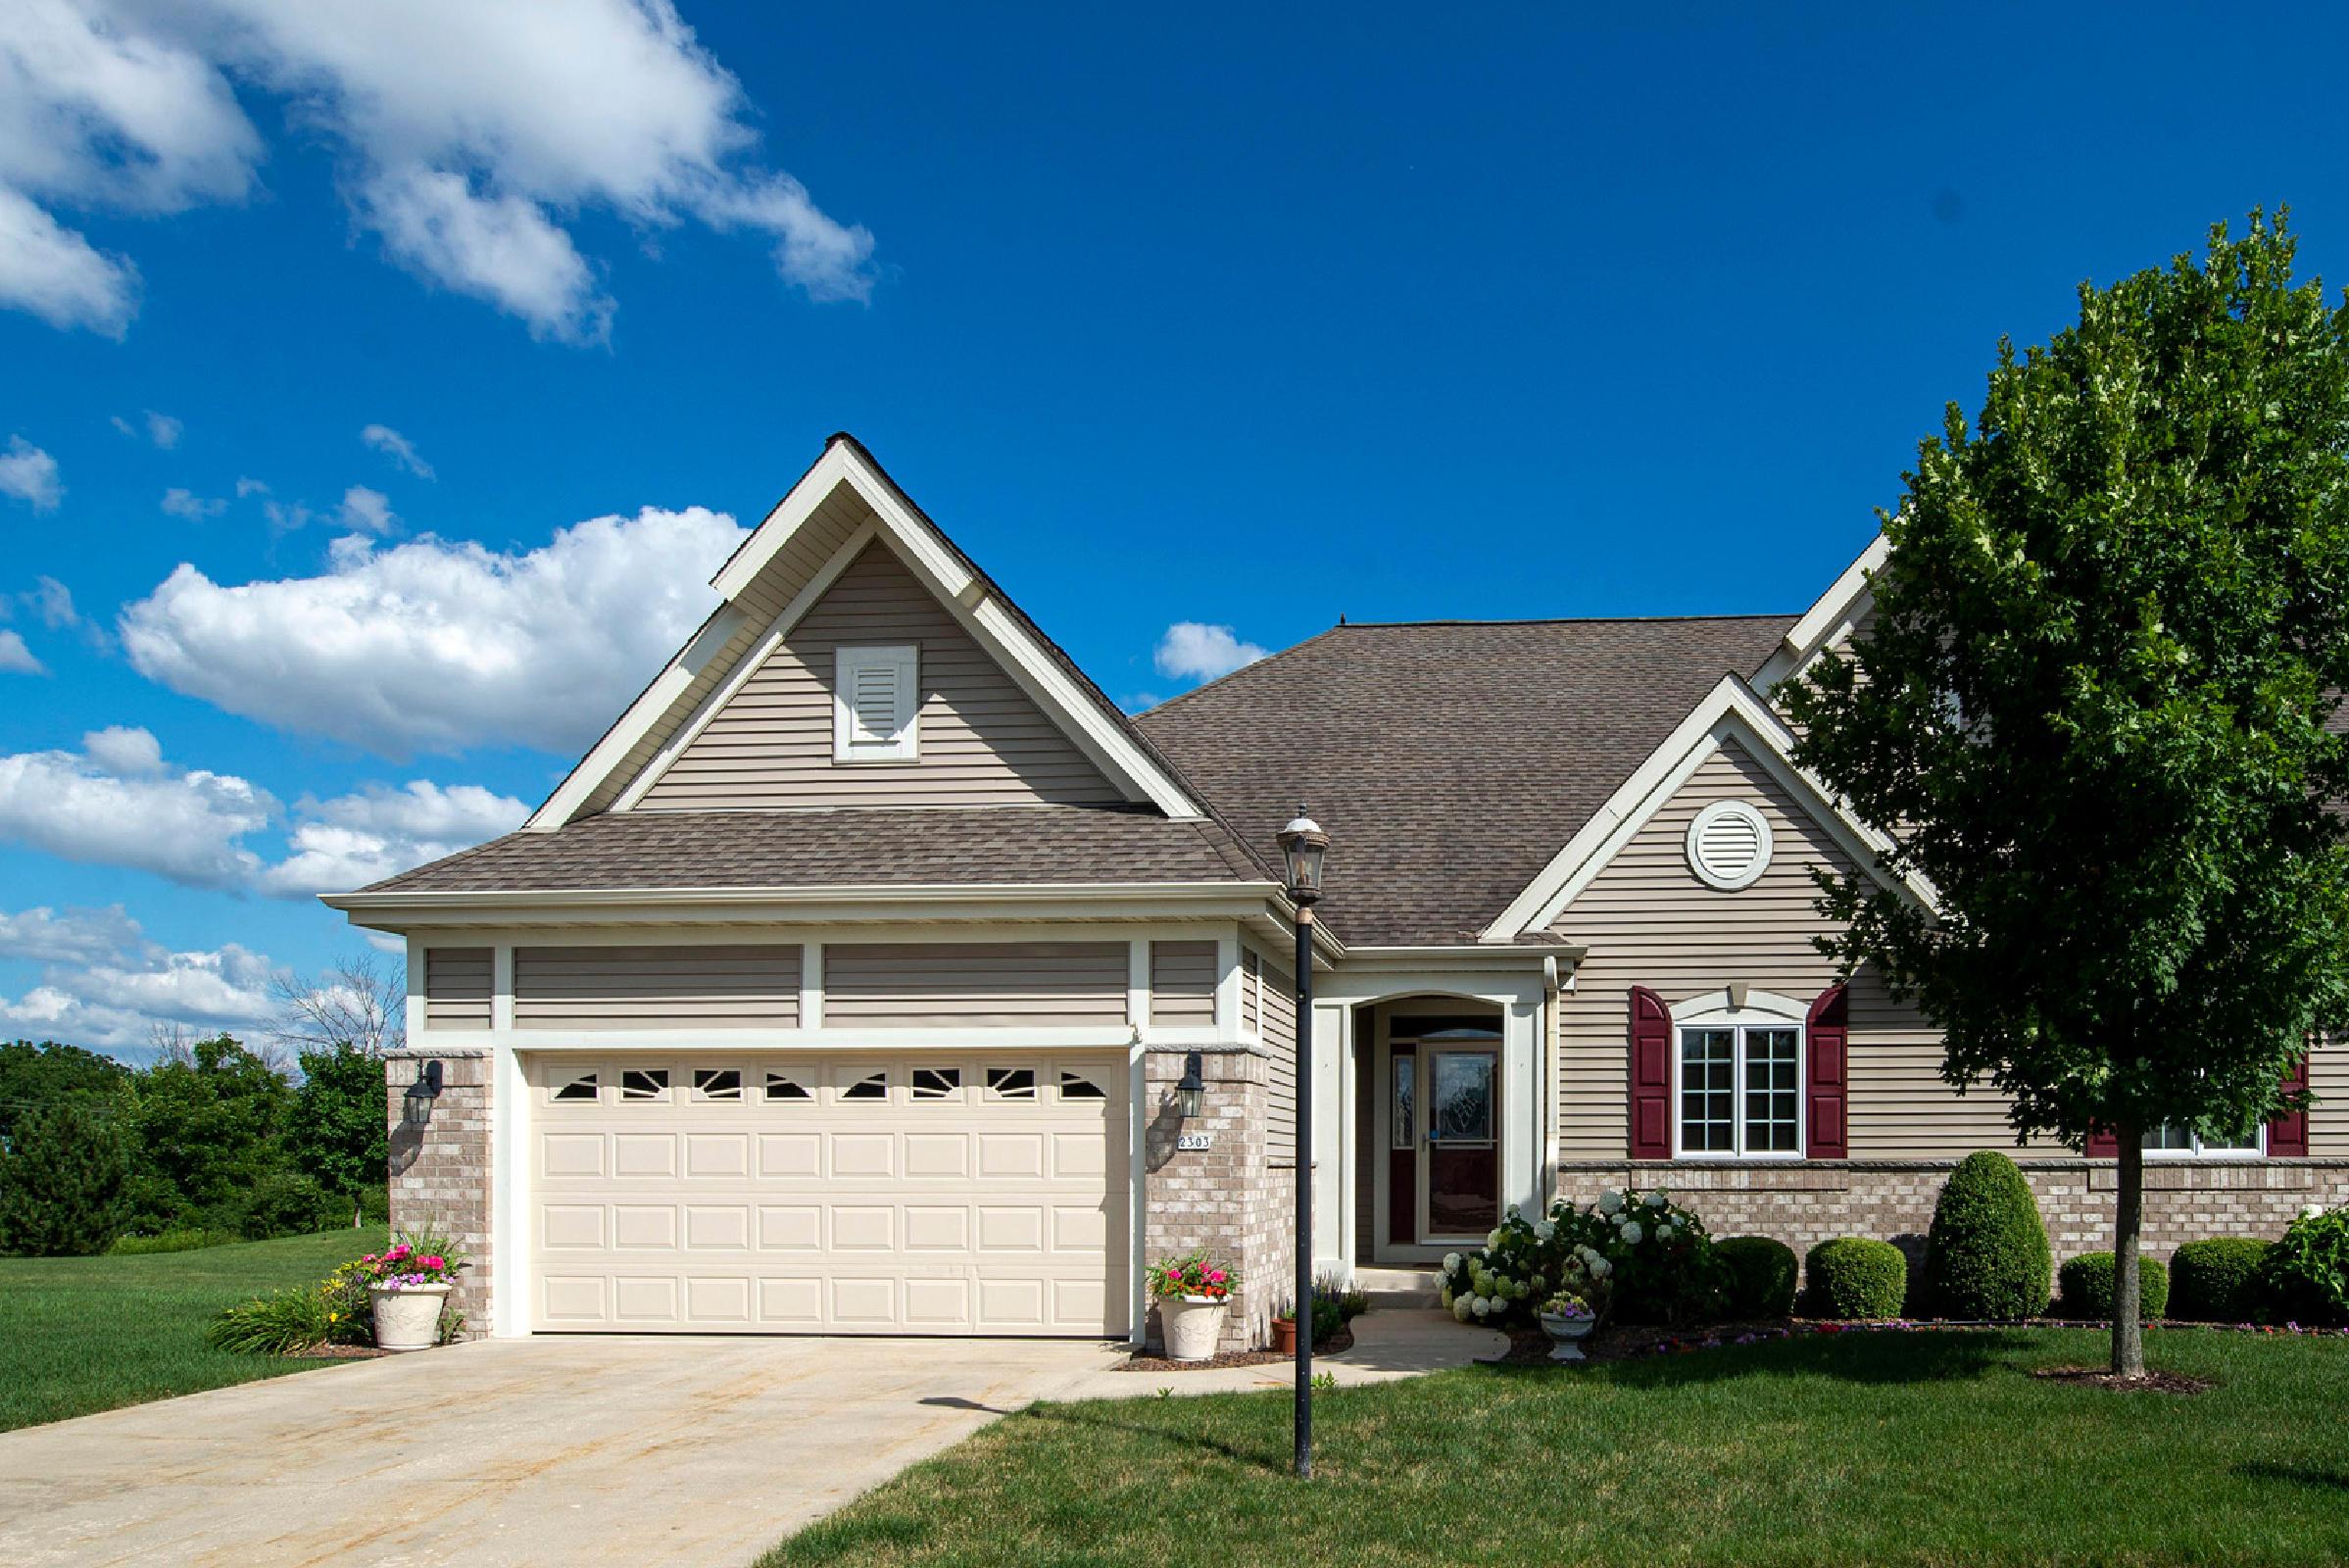 2303 Silver Fox Ct, Waukesha, Wisconsin 53188, 3 Bedrooms Bedrooms, 8 Rooms Rooms,3 BathroomsBathrooms,Condominiums,For Sale,Silver Fox Ct,1,1701684